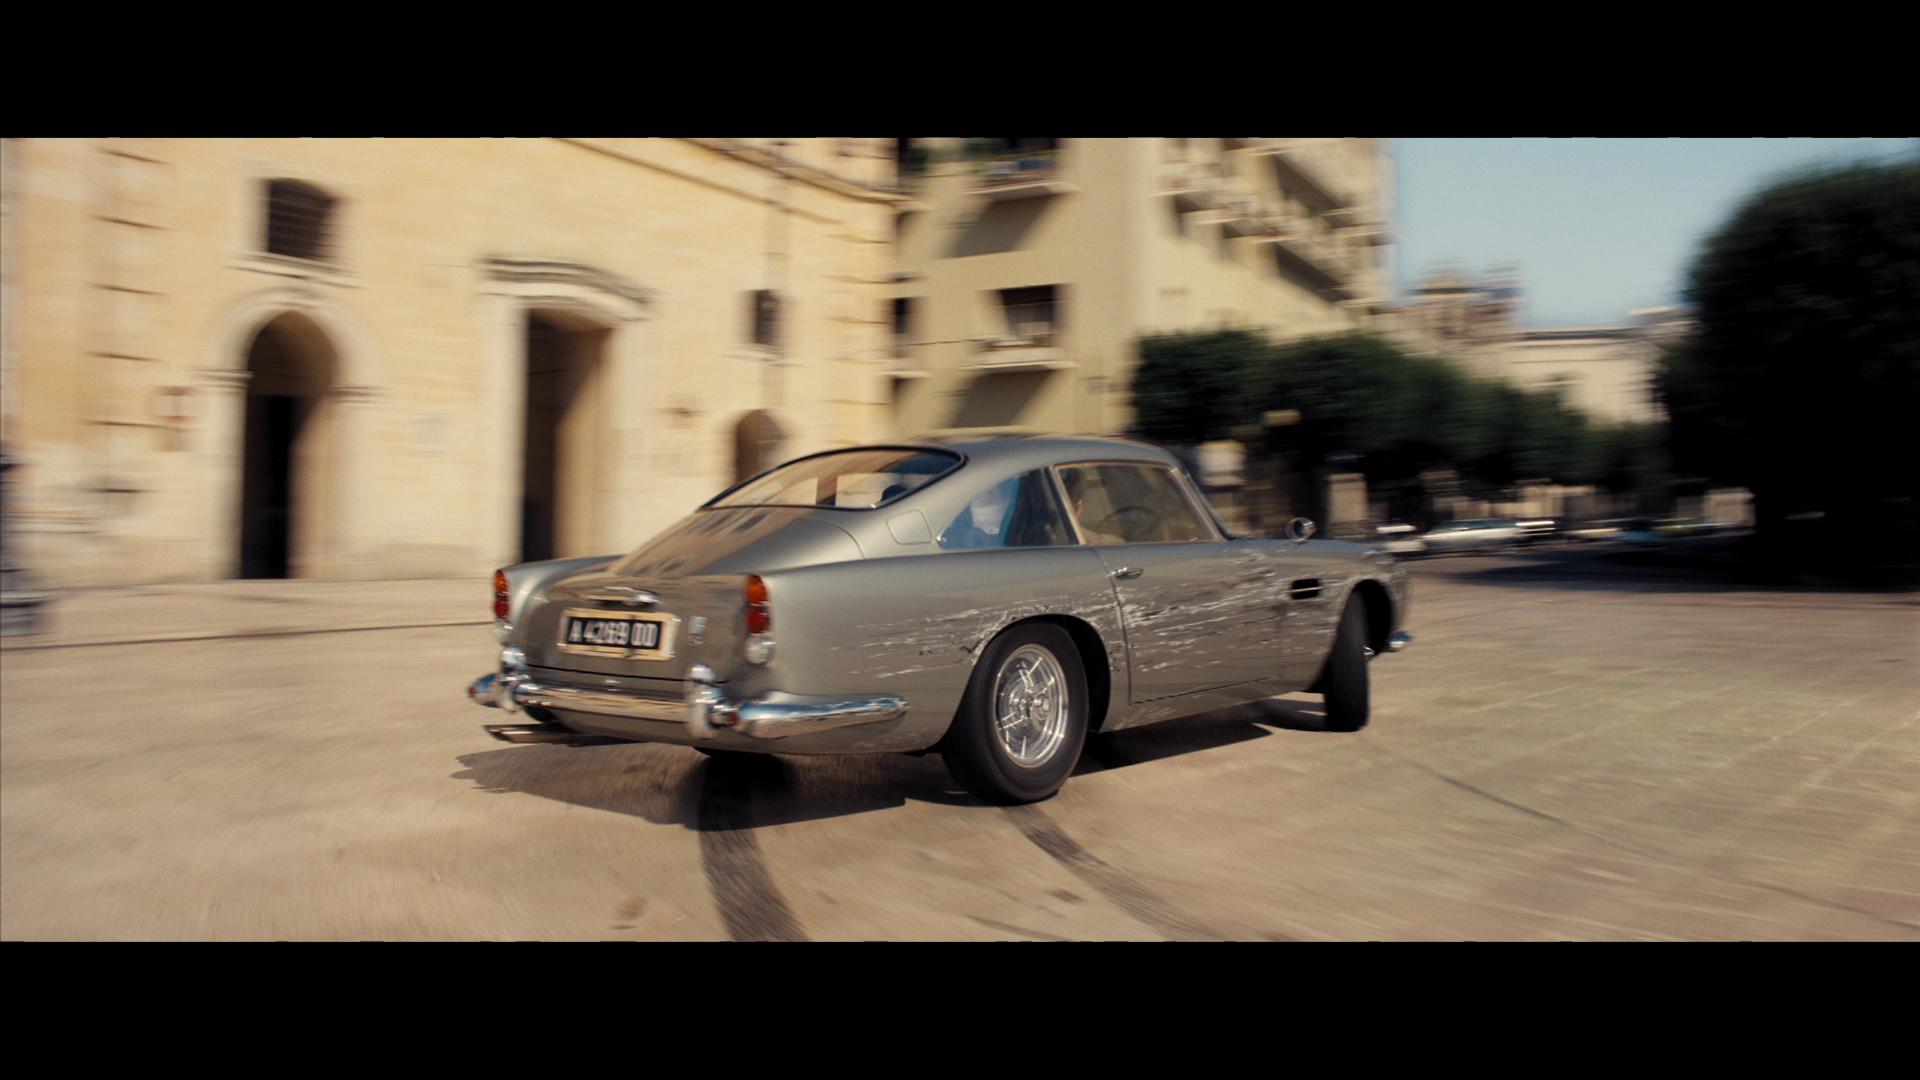 The Next Bond Film No Time To Die Mashes Up Aston Martins